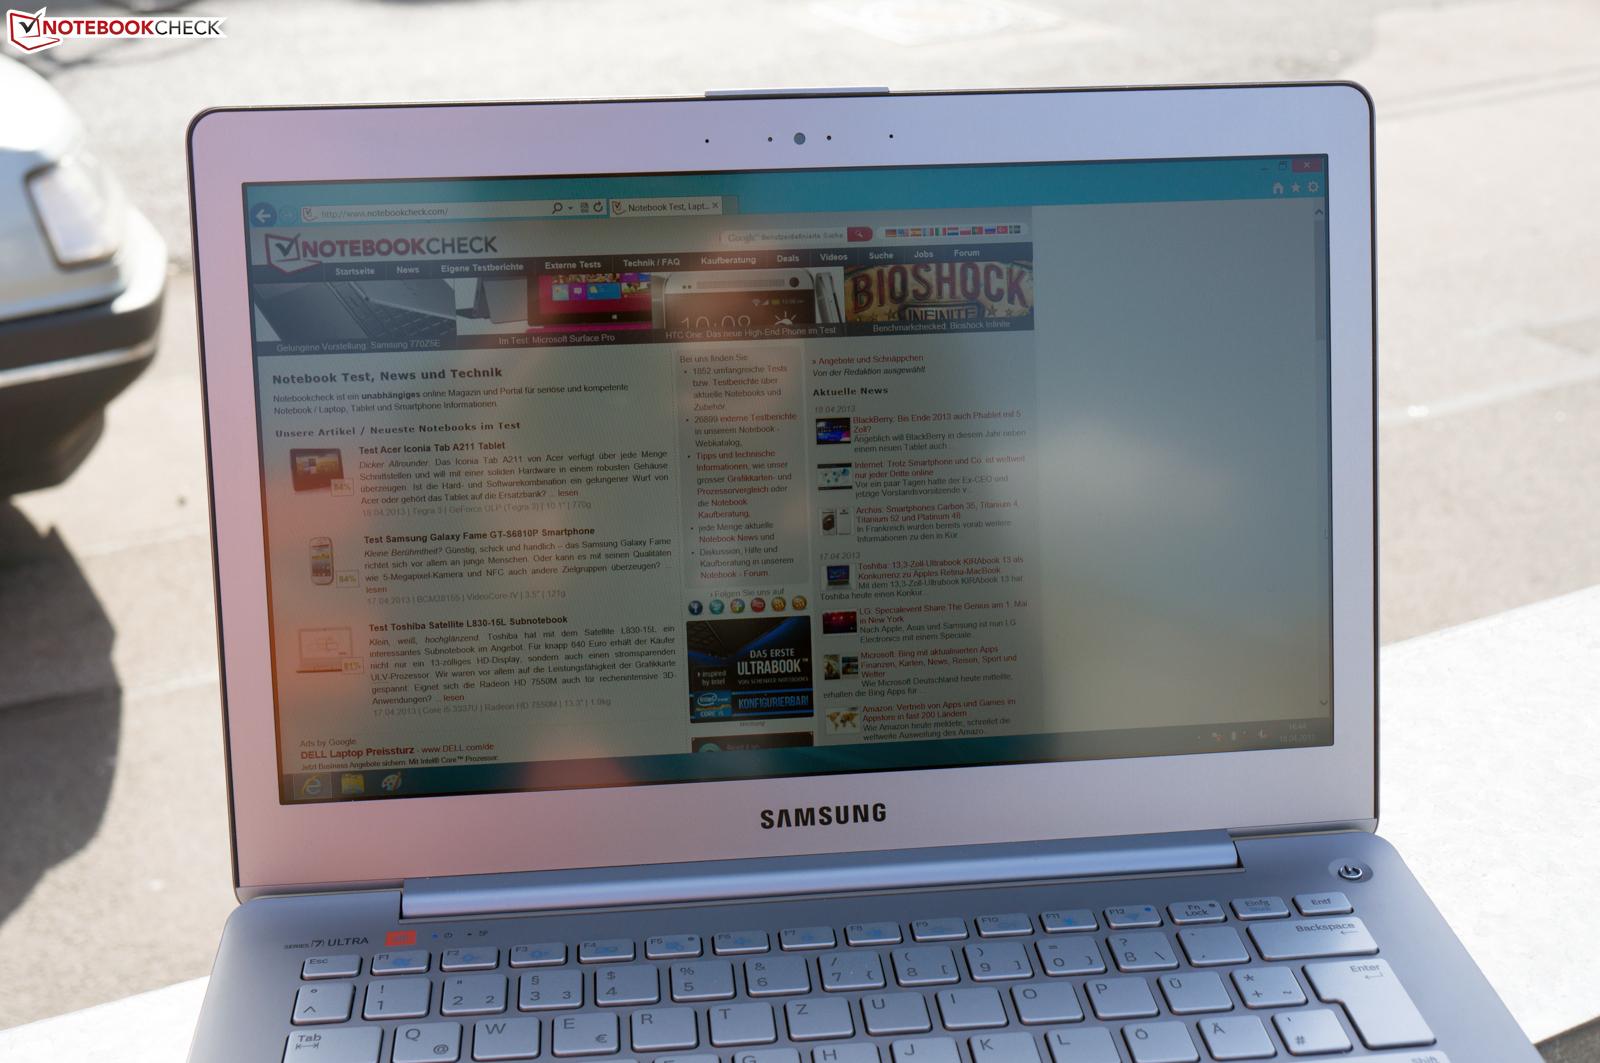 Notebook samsung jbl - Maximum Screen Brightness Outdoors